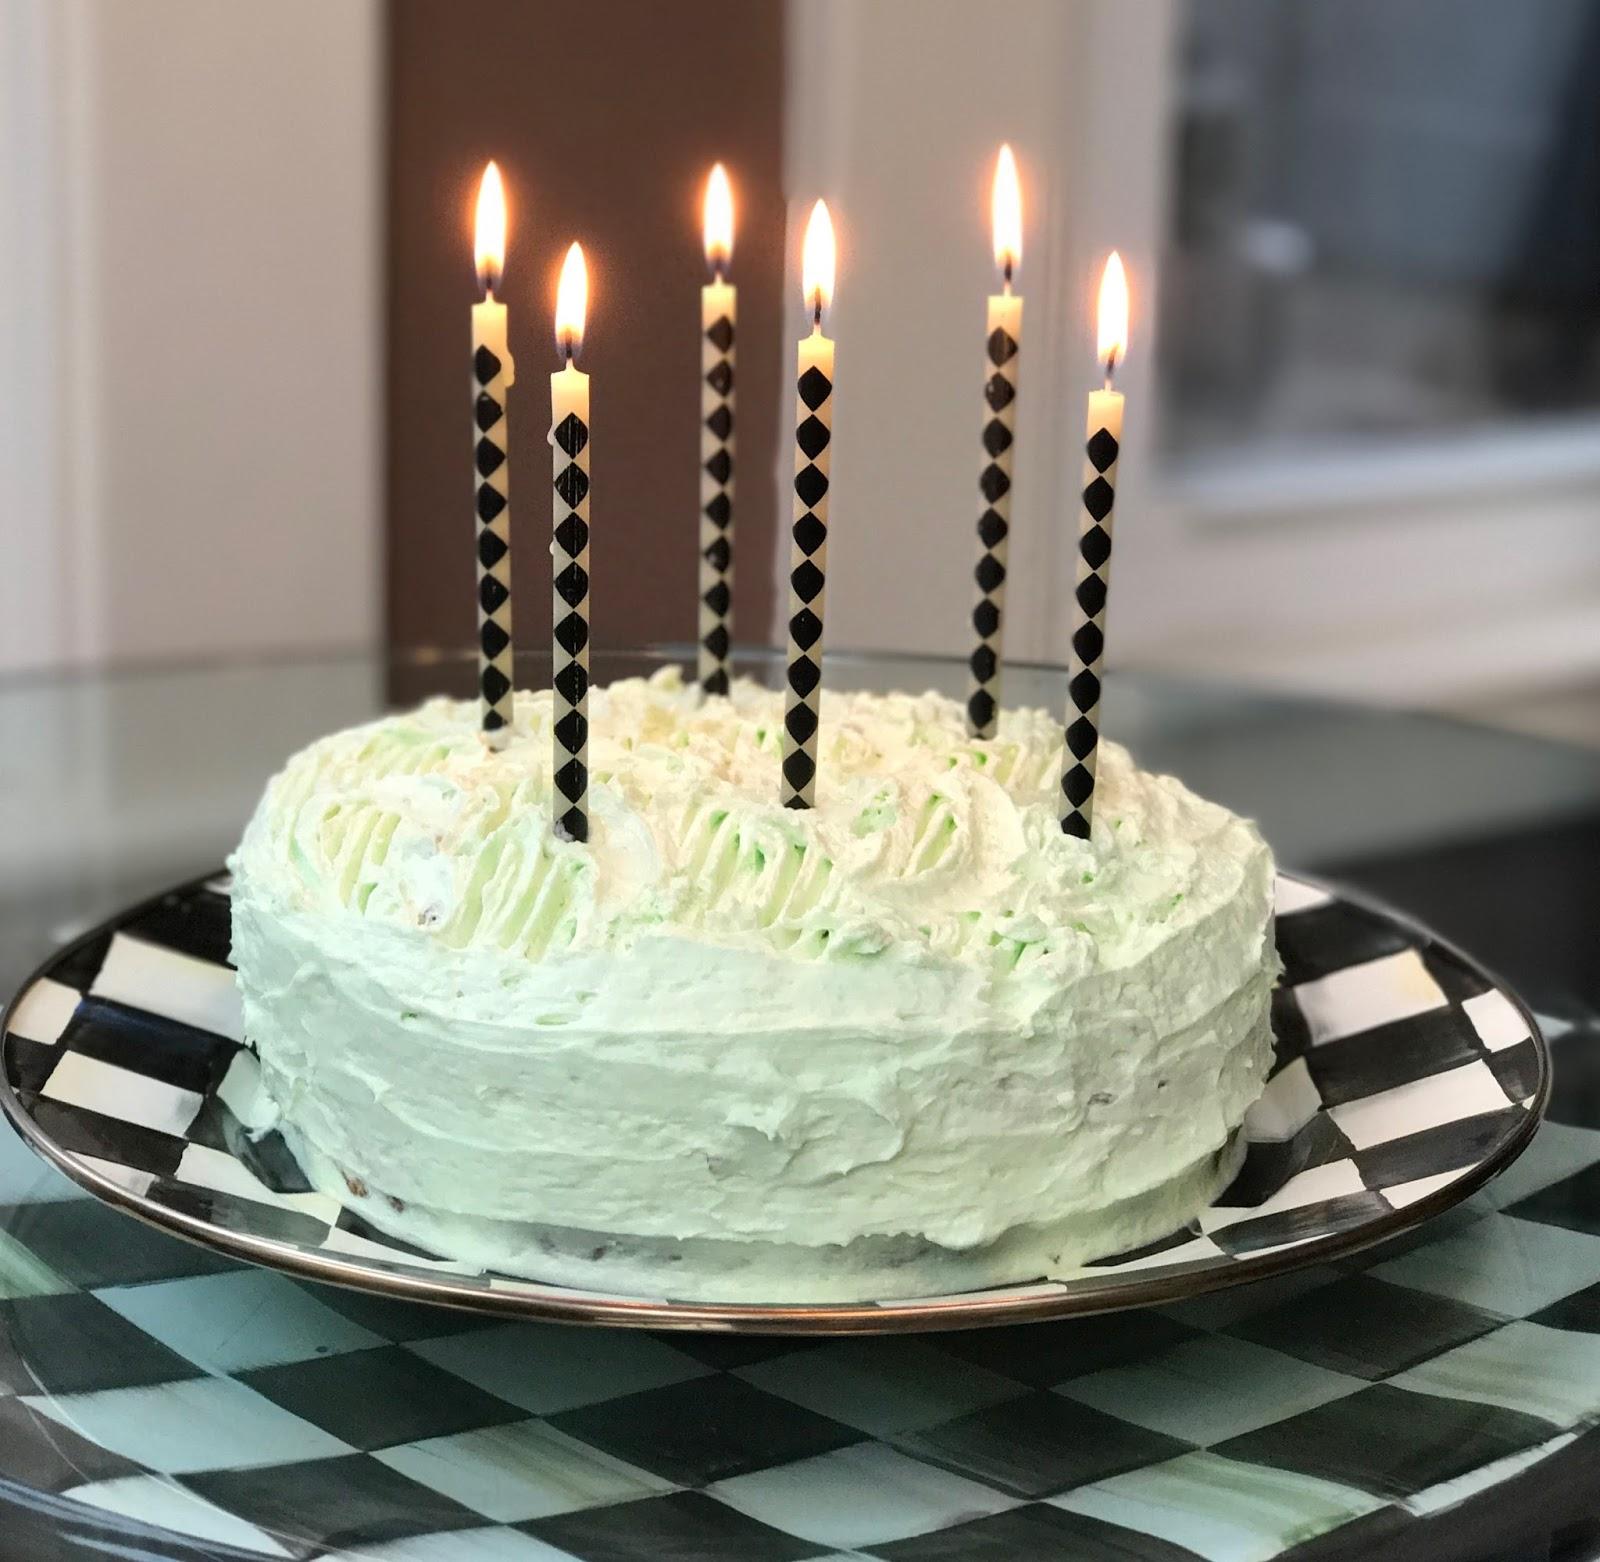 Pistachio Cake My Favorite Birthday Cake Mountain Breaths - Favorite birthday cake